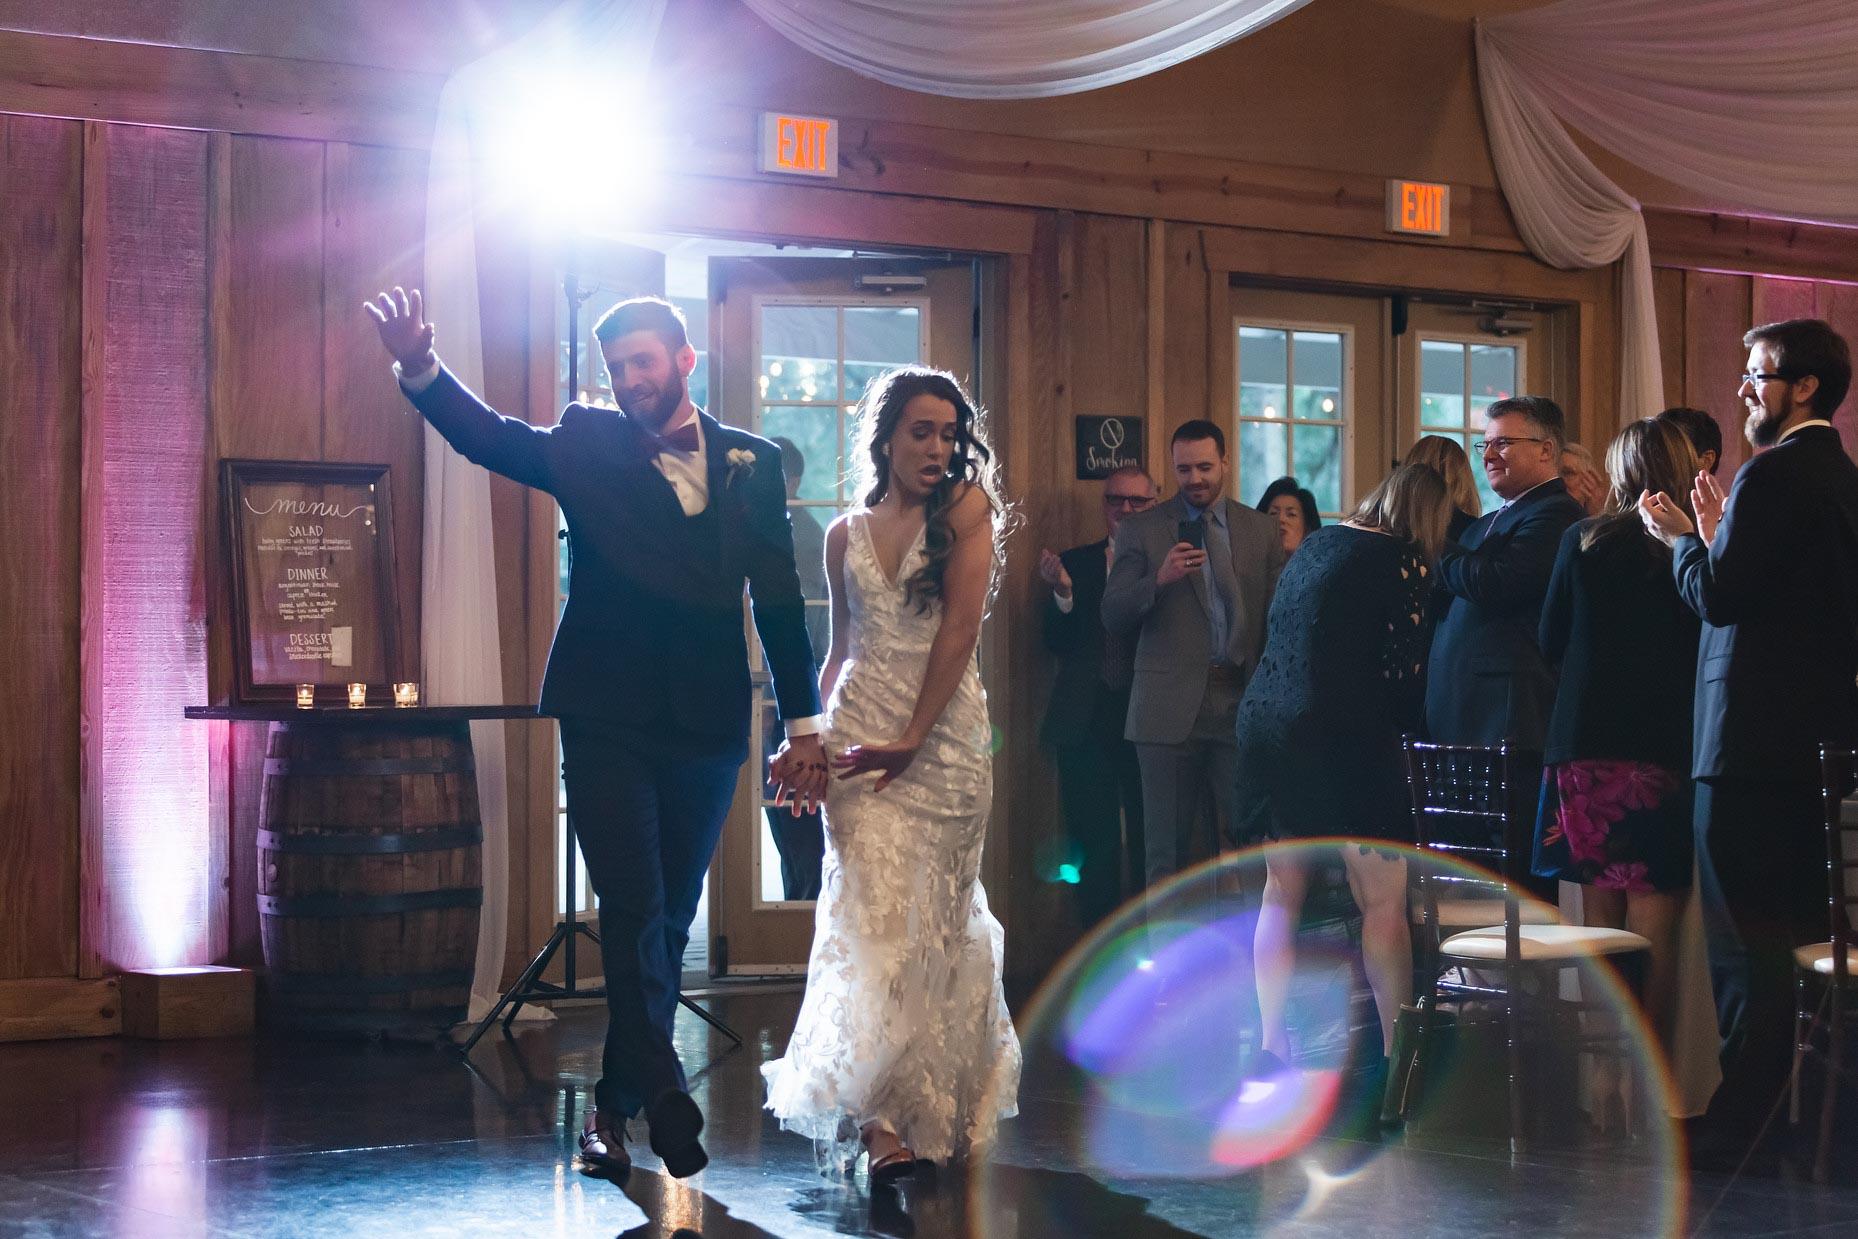 adam-szarmack-bowing-oaks-wedding-photographer-jacksonville-115.jpg